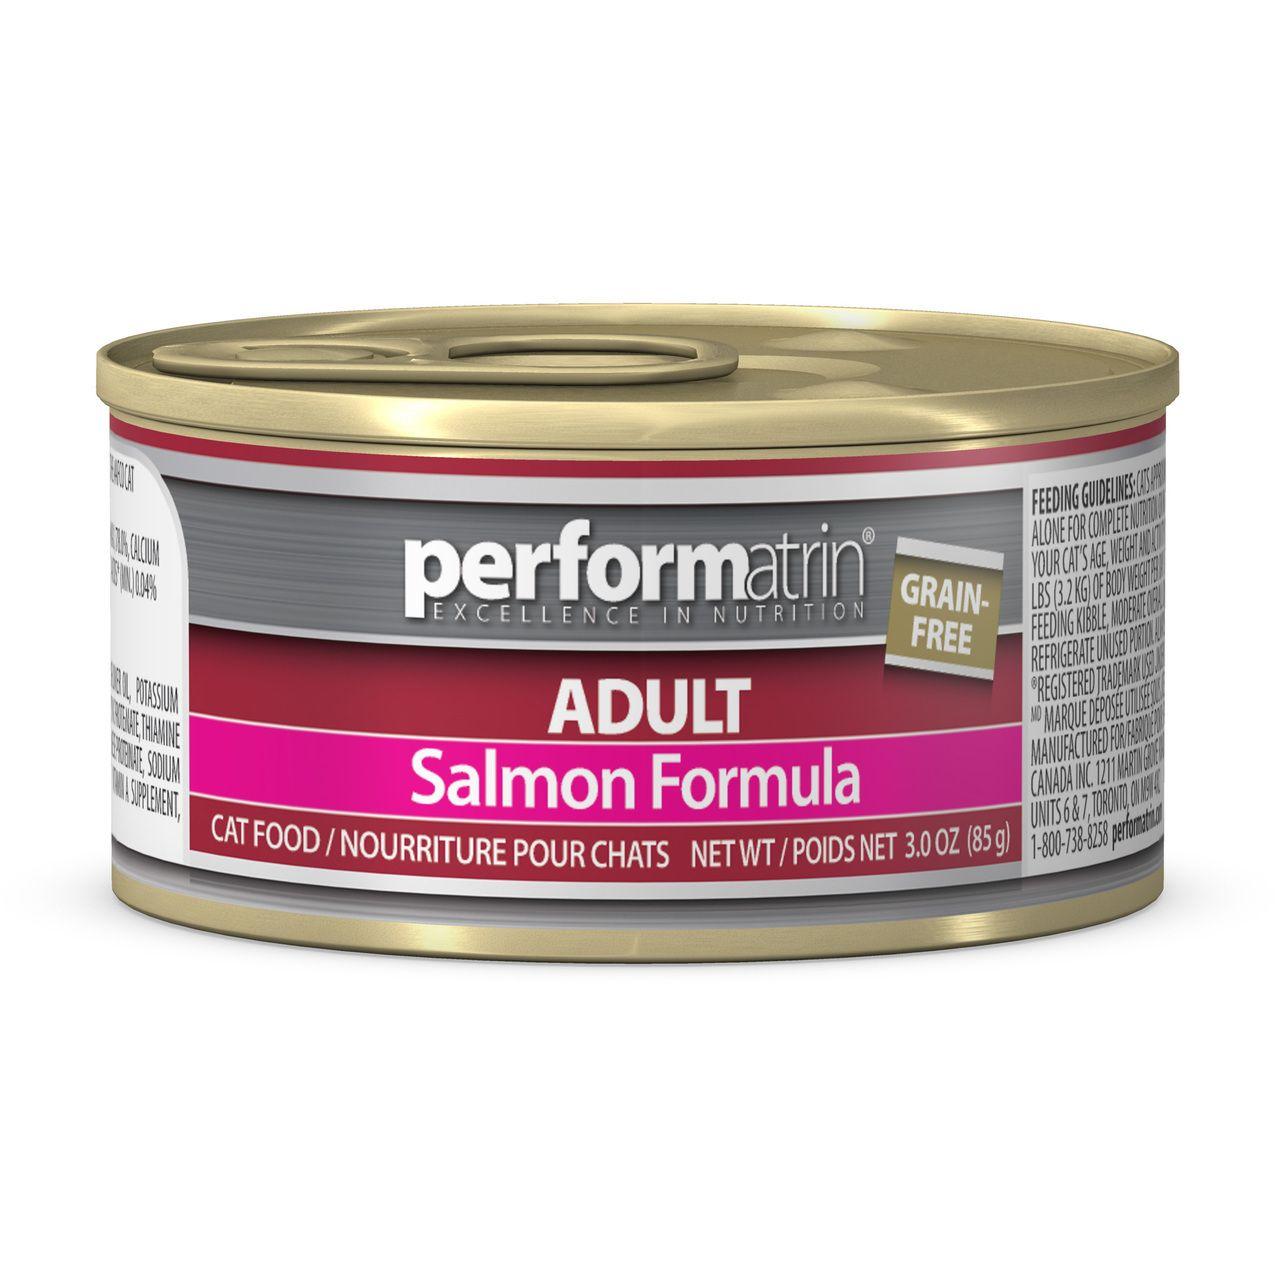 Adult grain free salmon formula cat food 3oz case of 24